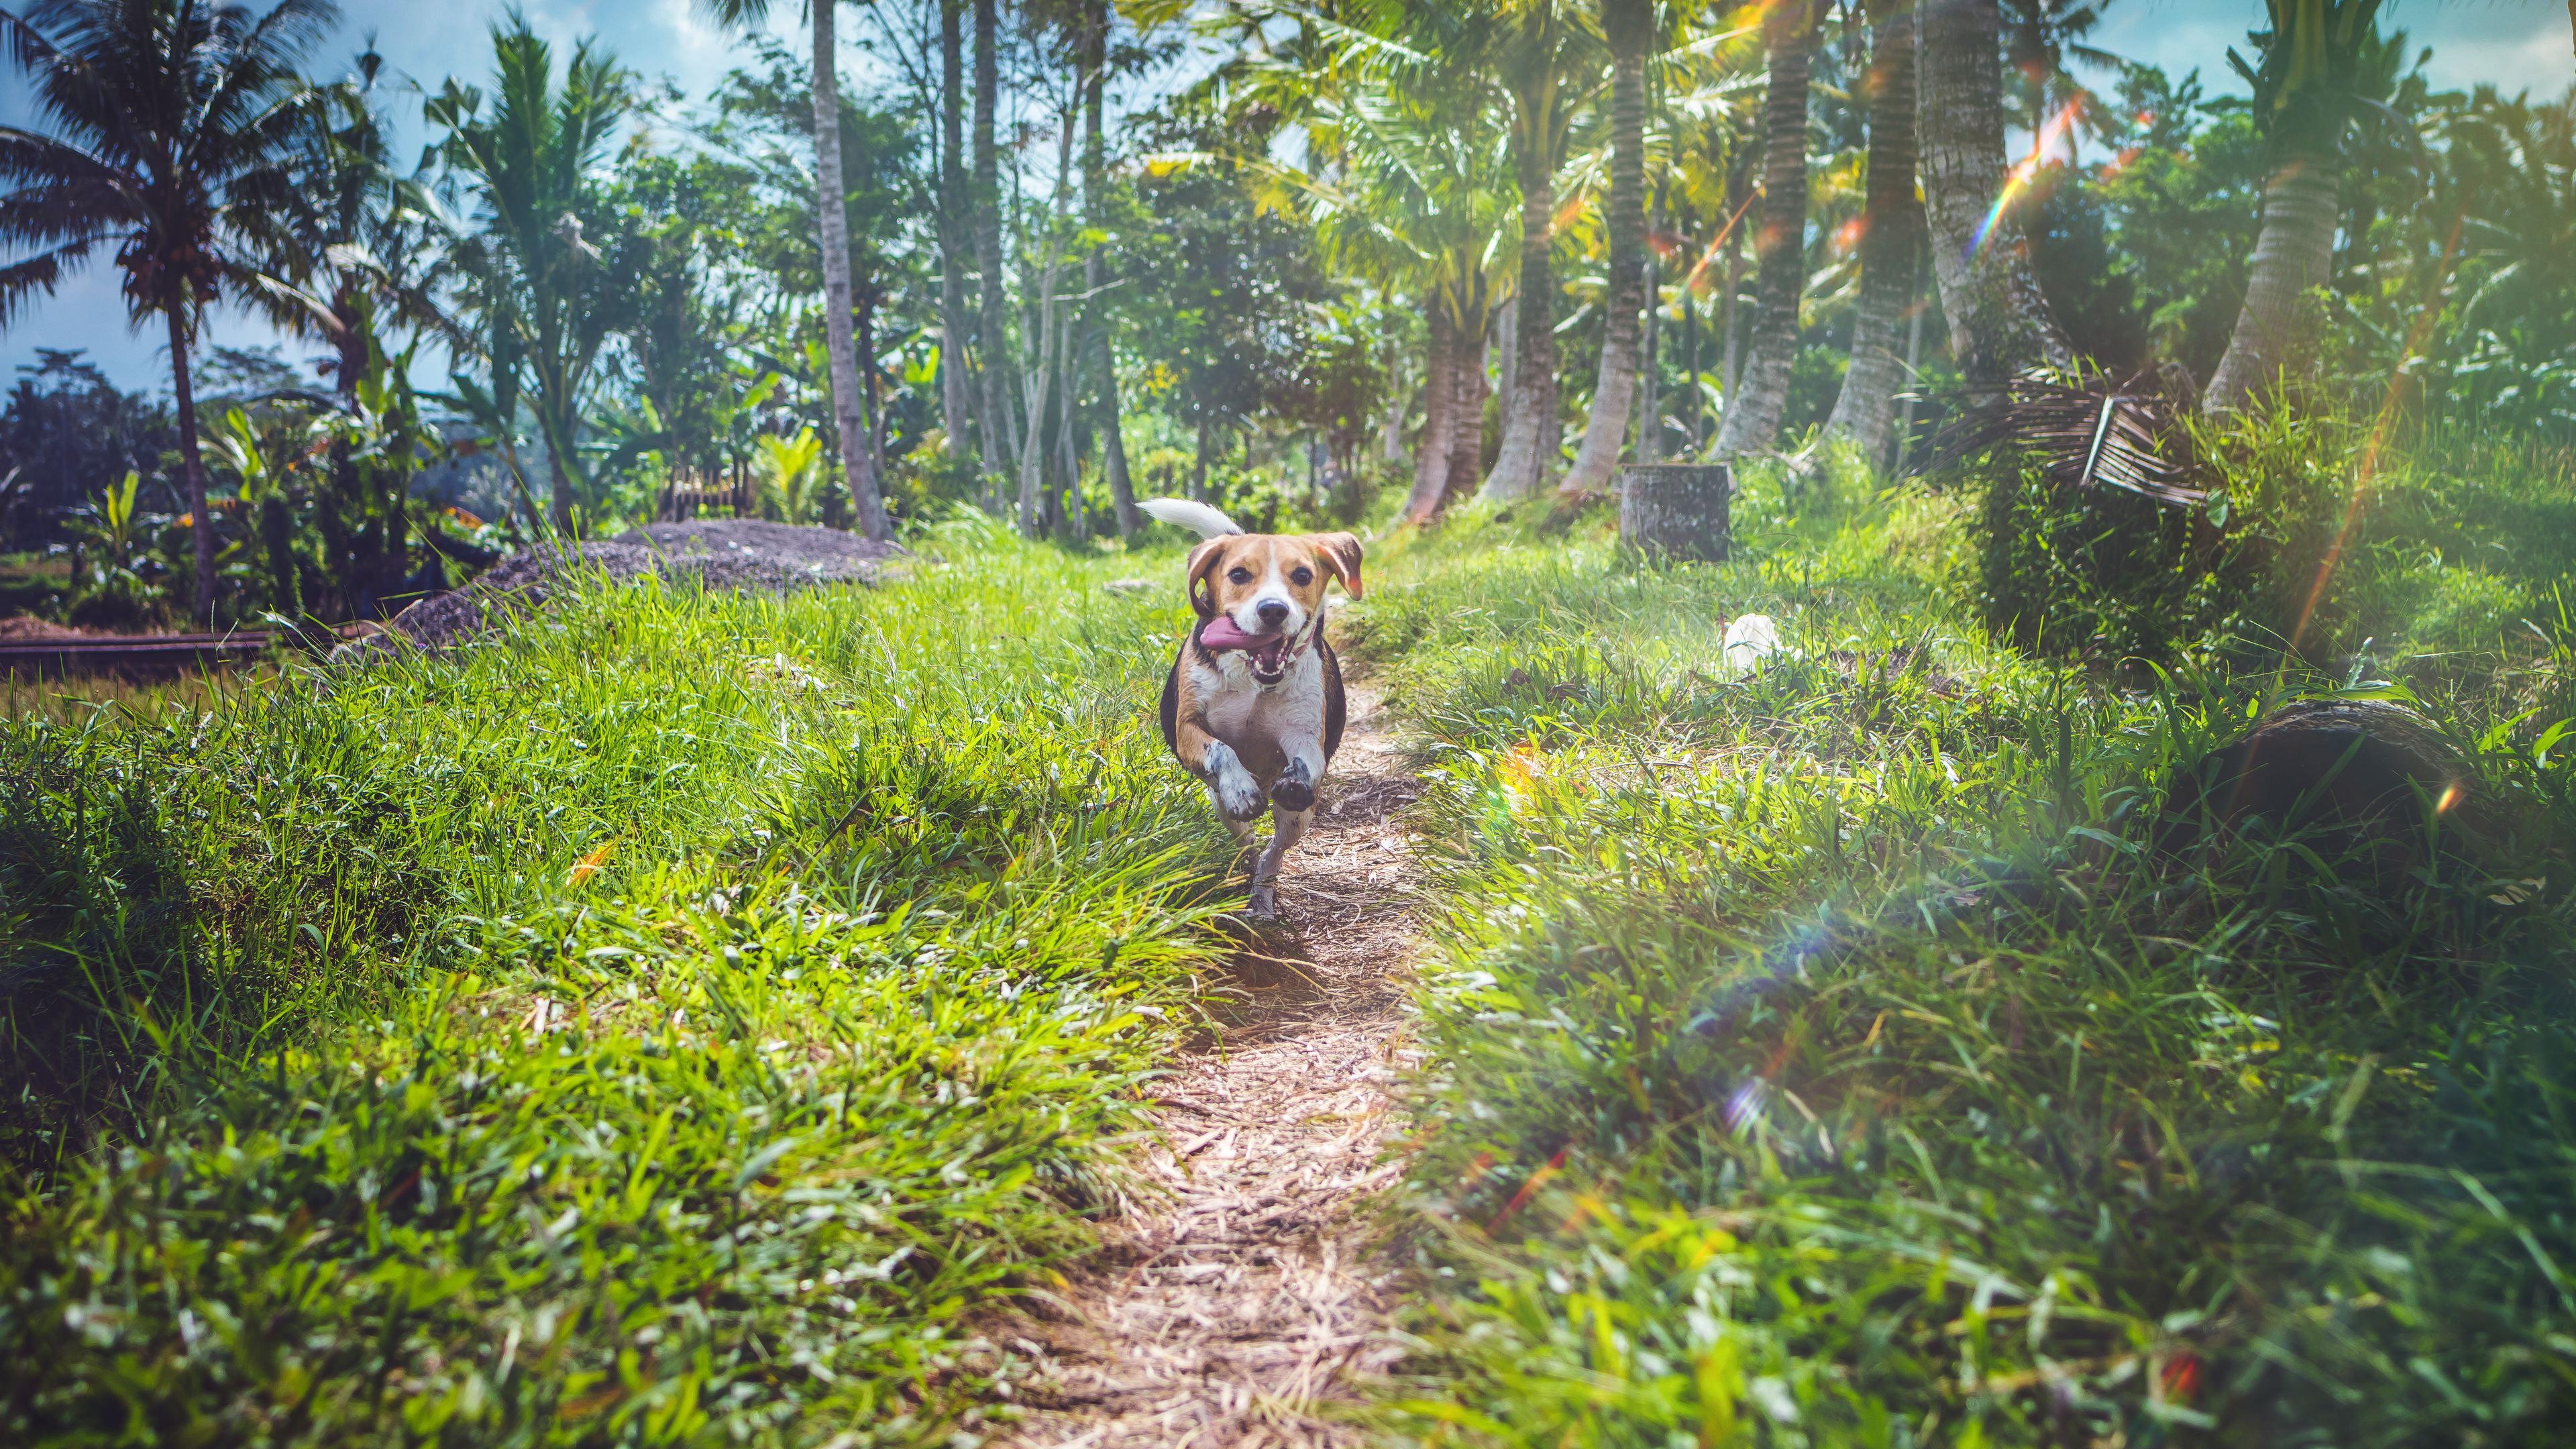 beagle dog in joy 4k 1542239638 - Beagle Dog In Joy 4k - hd-wallpapers, dog wallpapers, beagle wallpapers, animals wallpapers, 4k-wallpapers